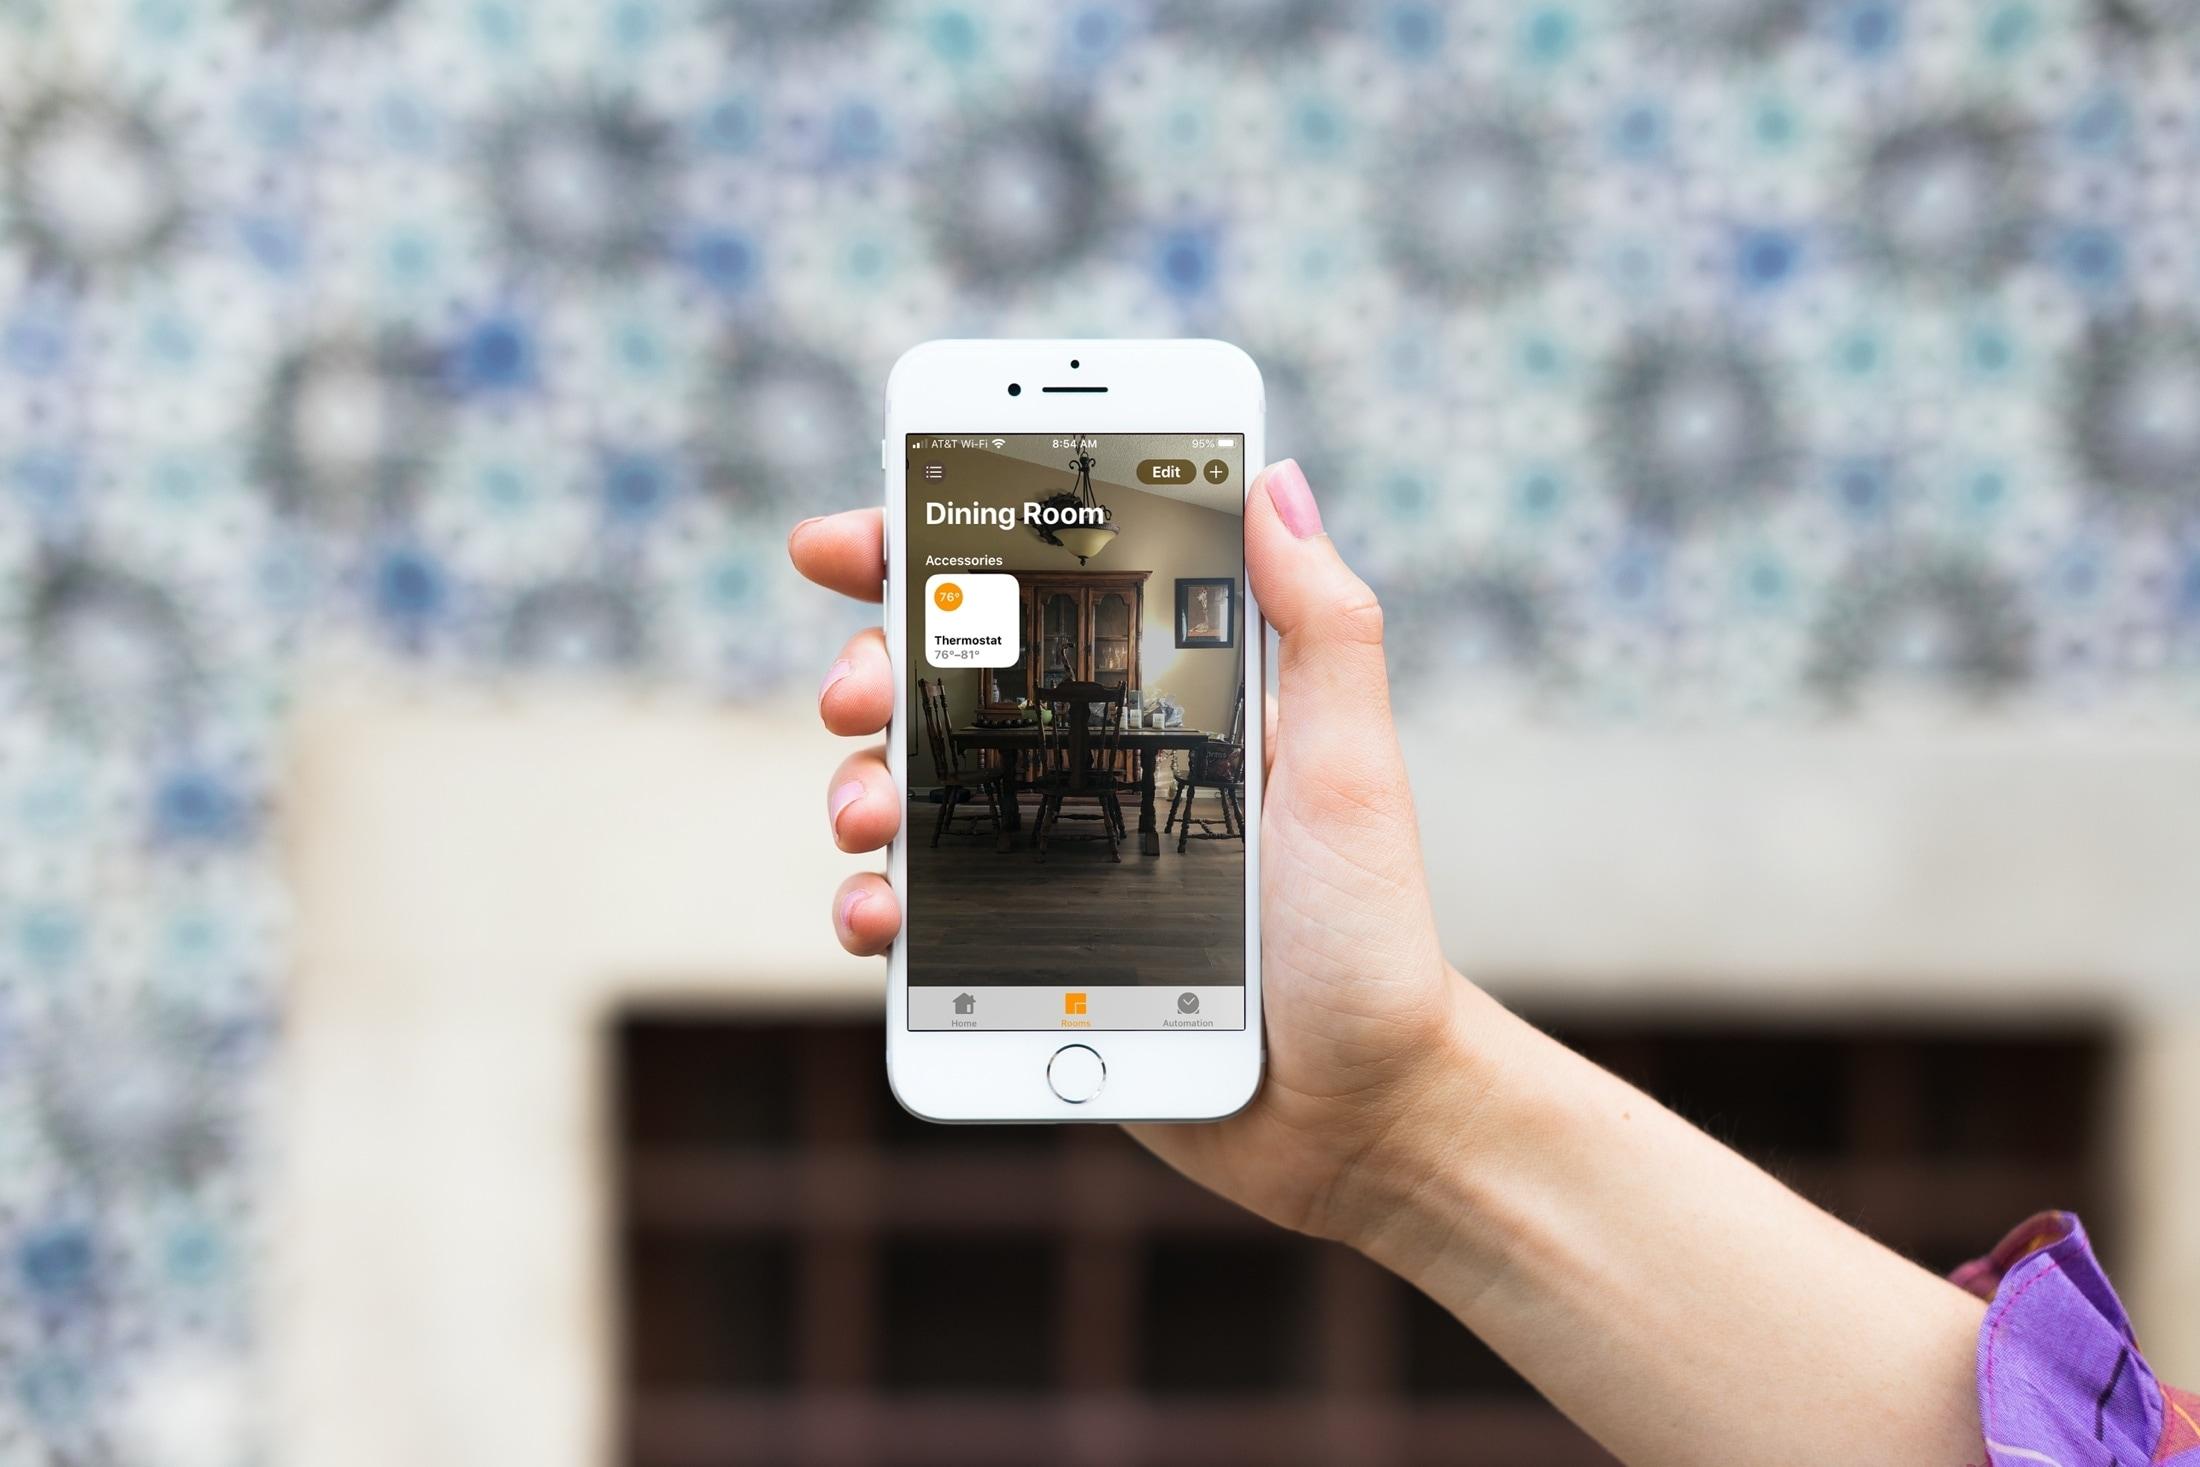 Change Home app wallpaper